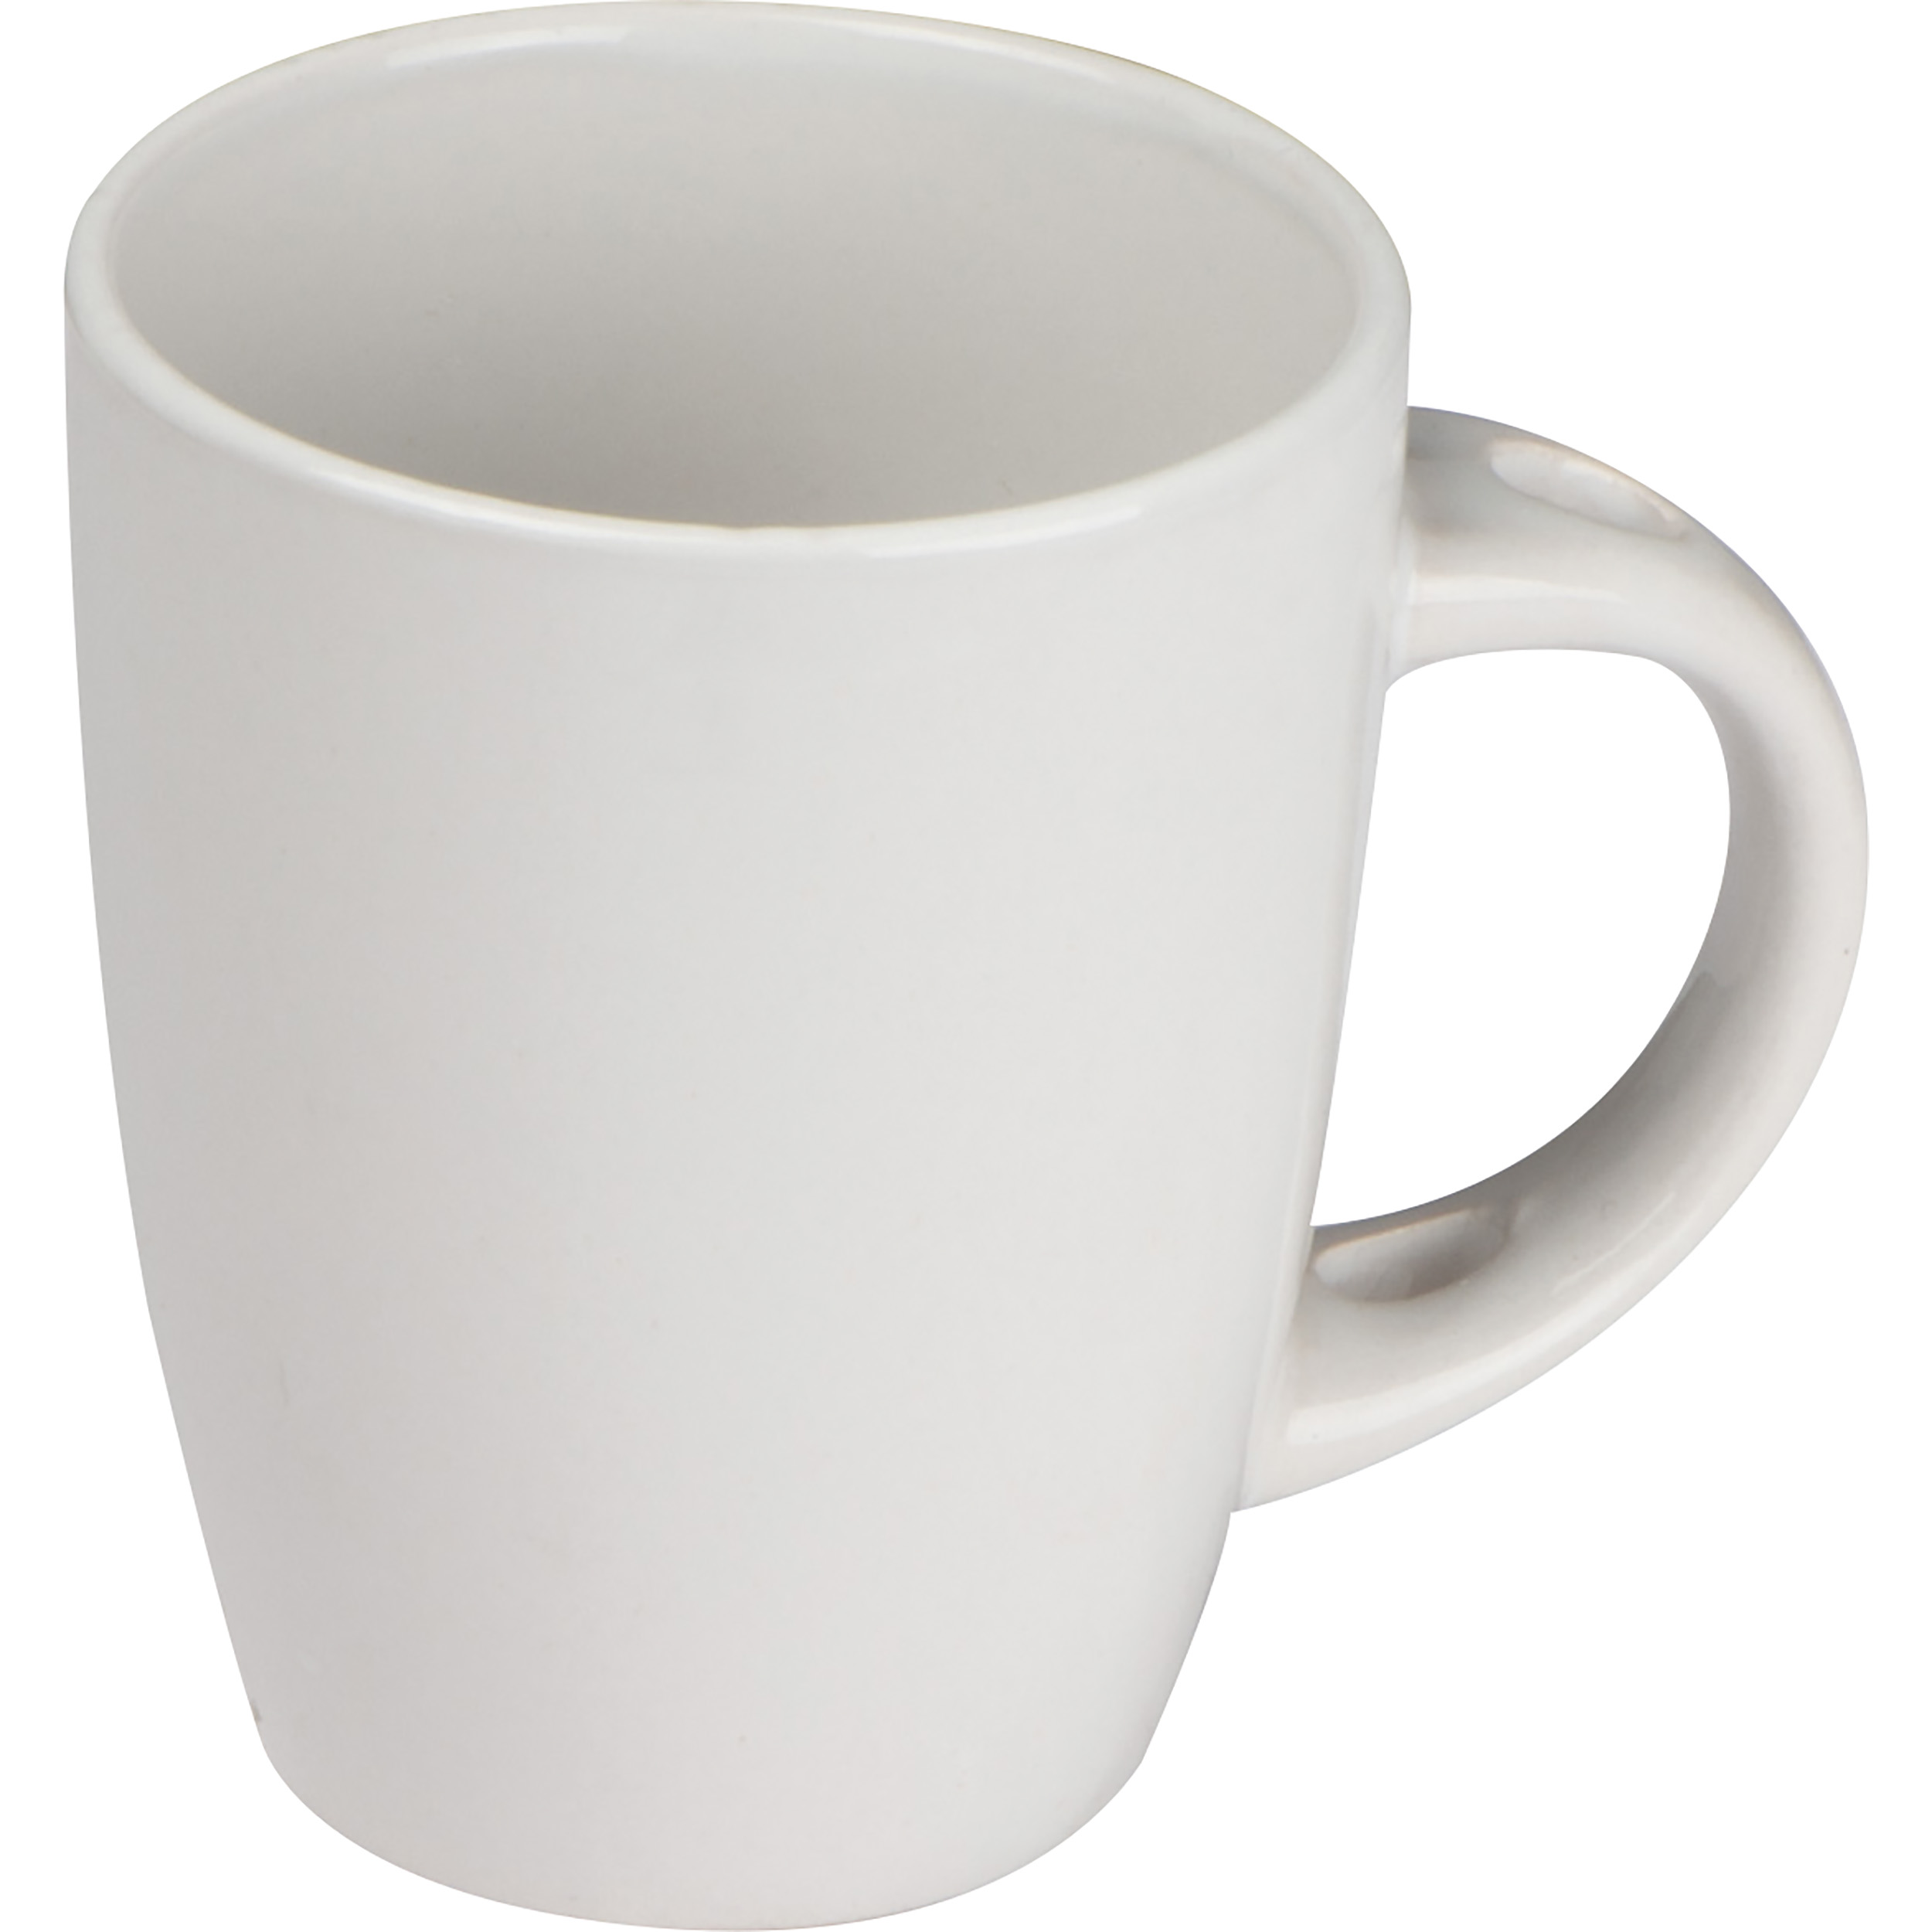 Tasse aus Keramik, 350 ml